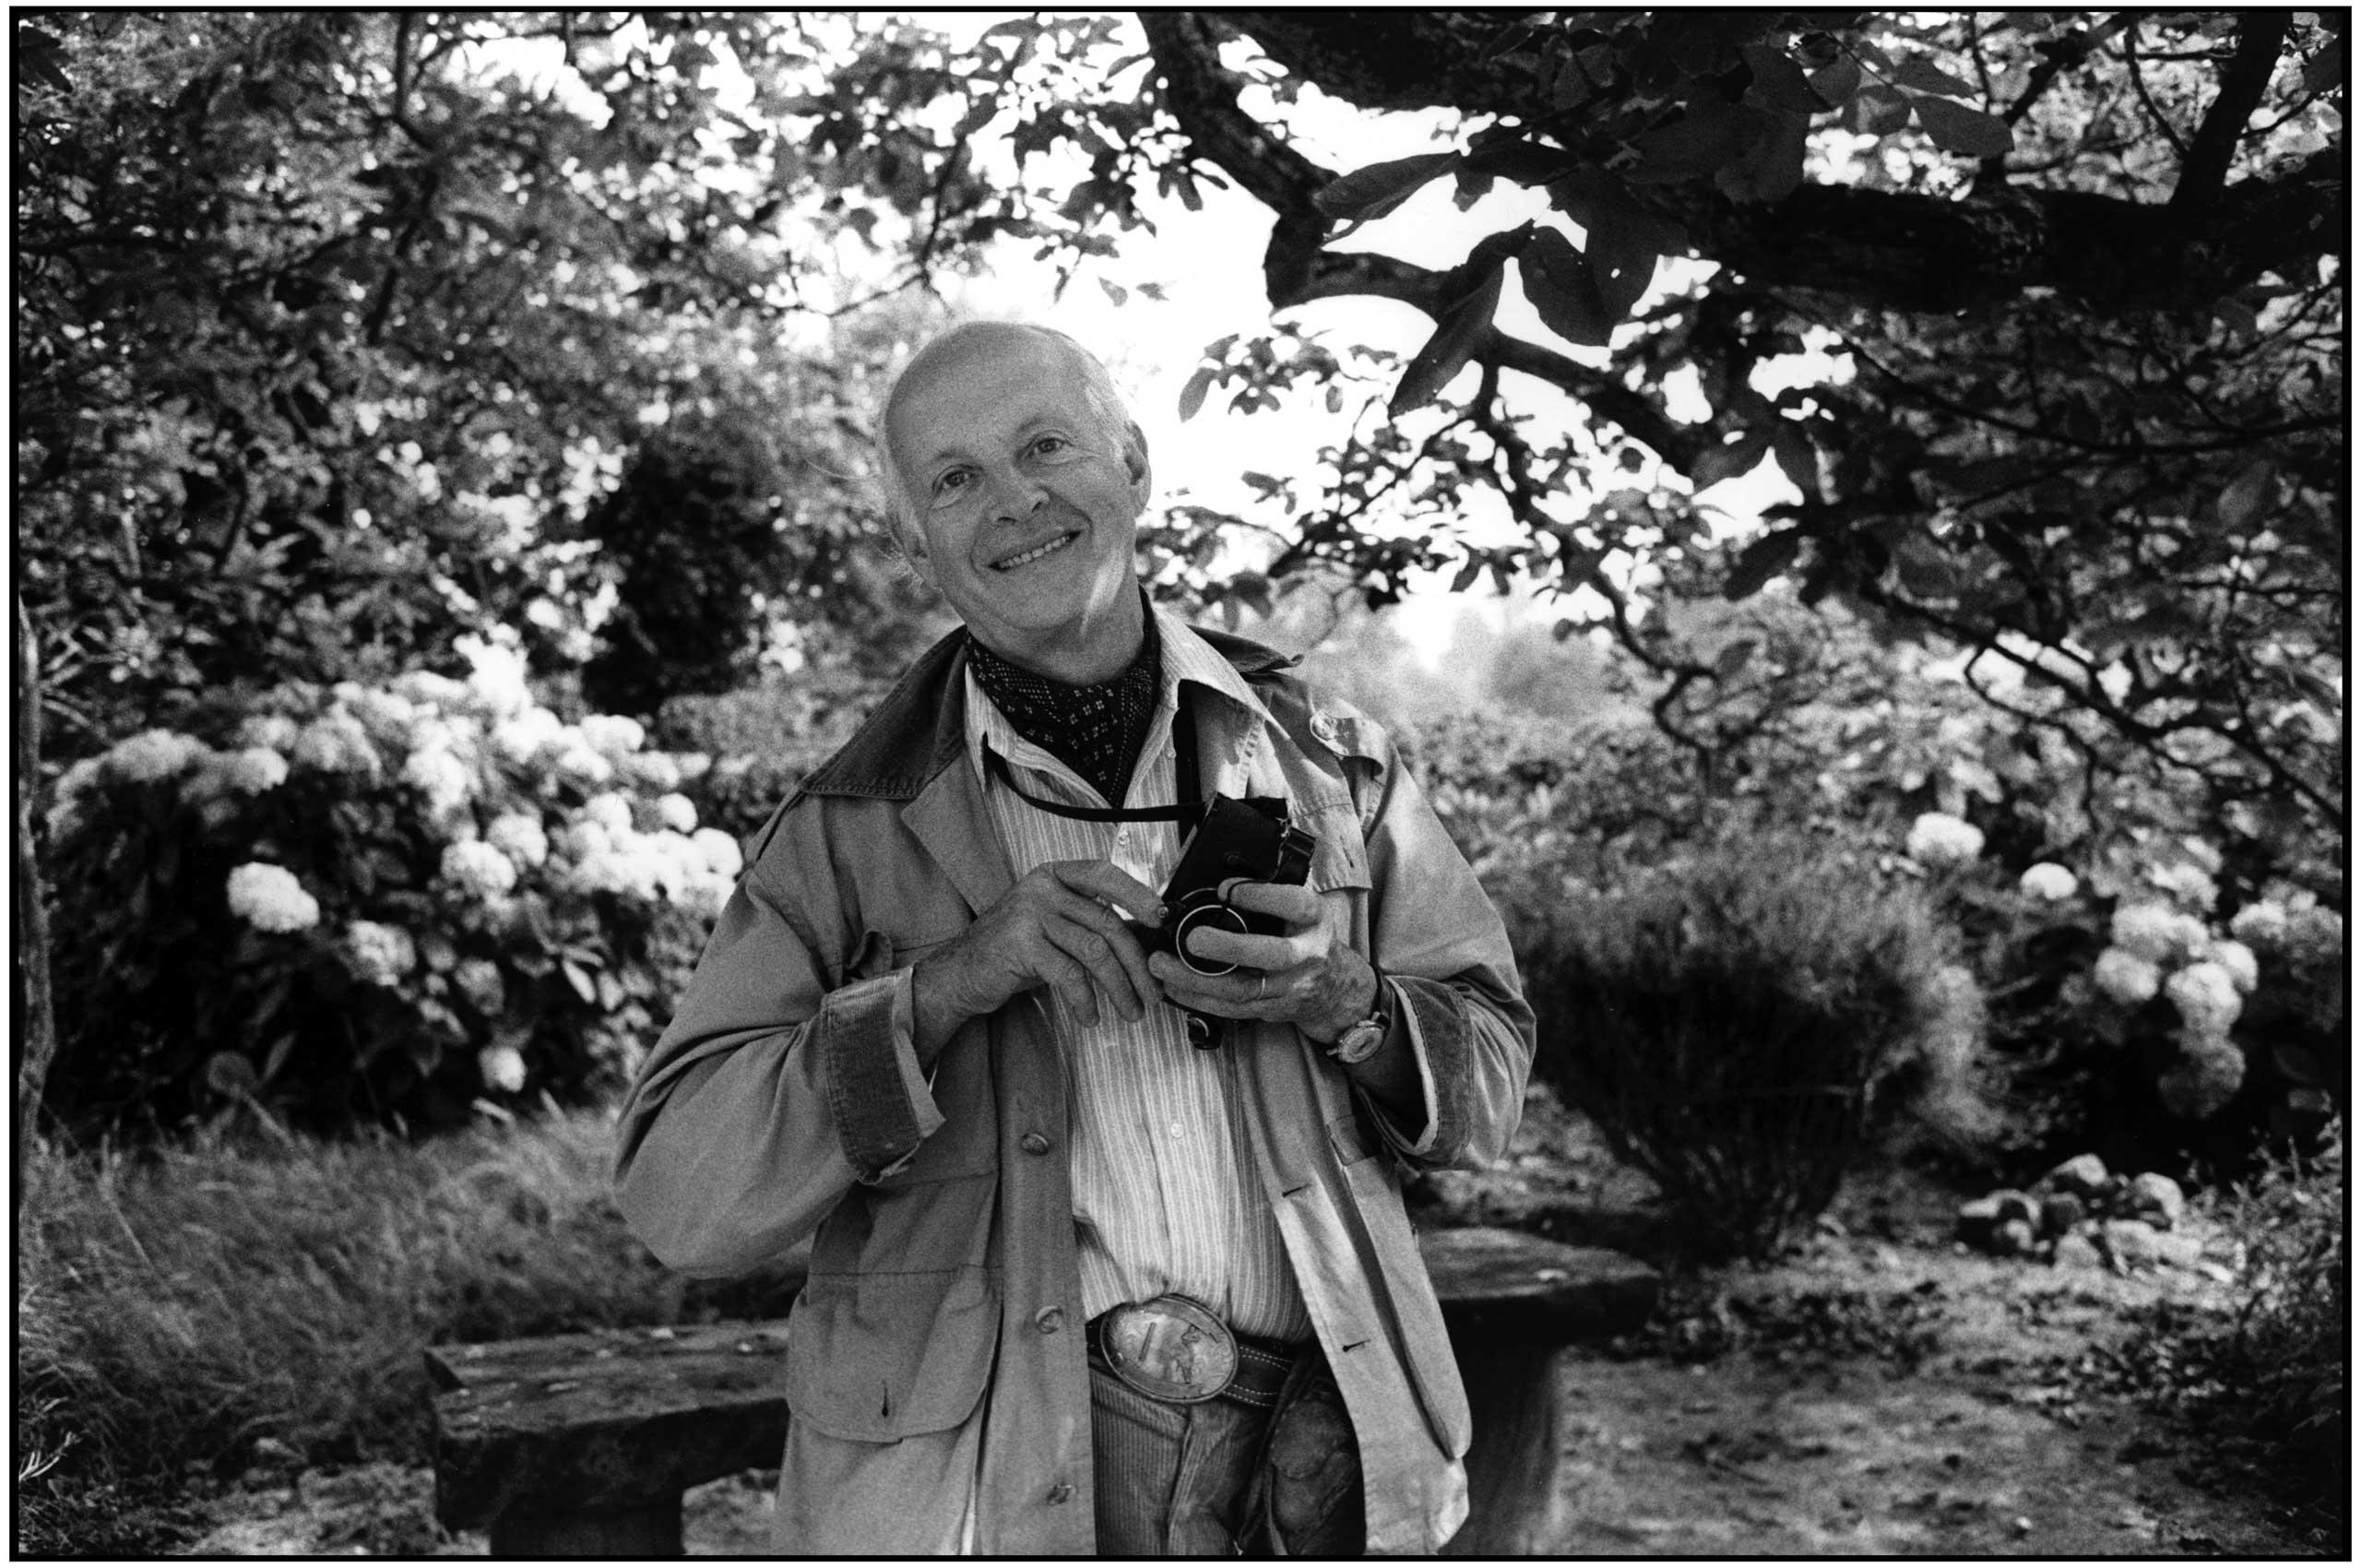 Henri Cartier-Bresson in Normandy, France, 1970.